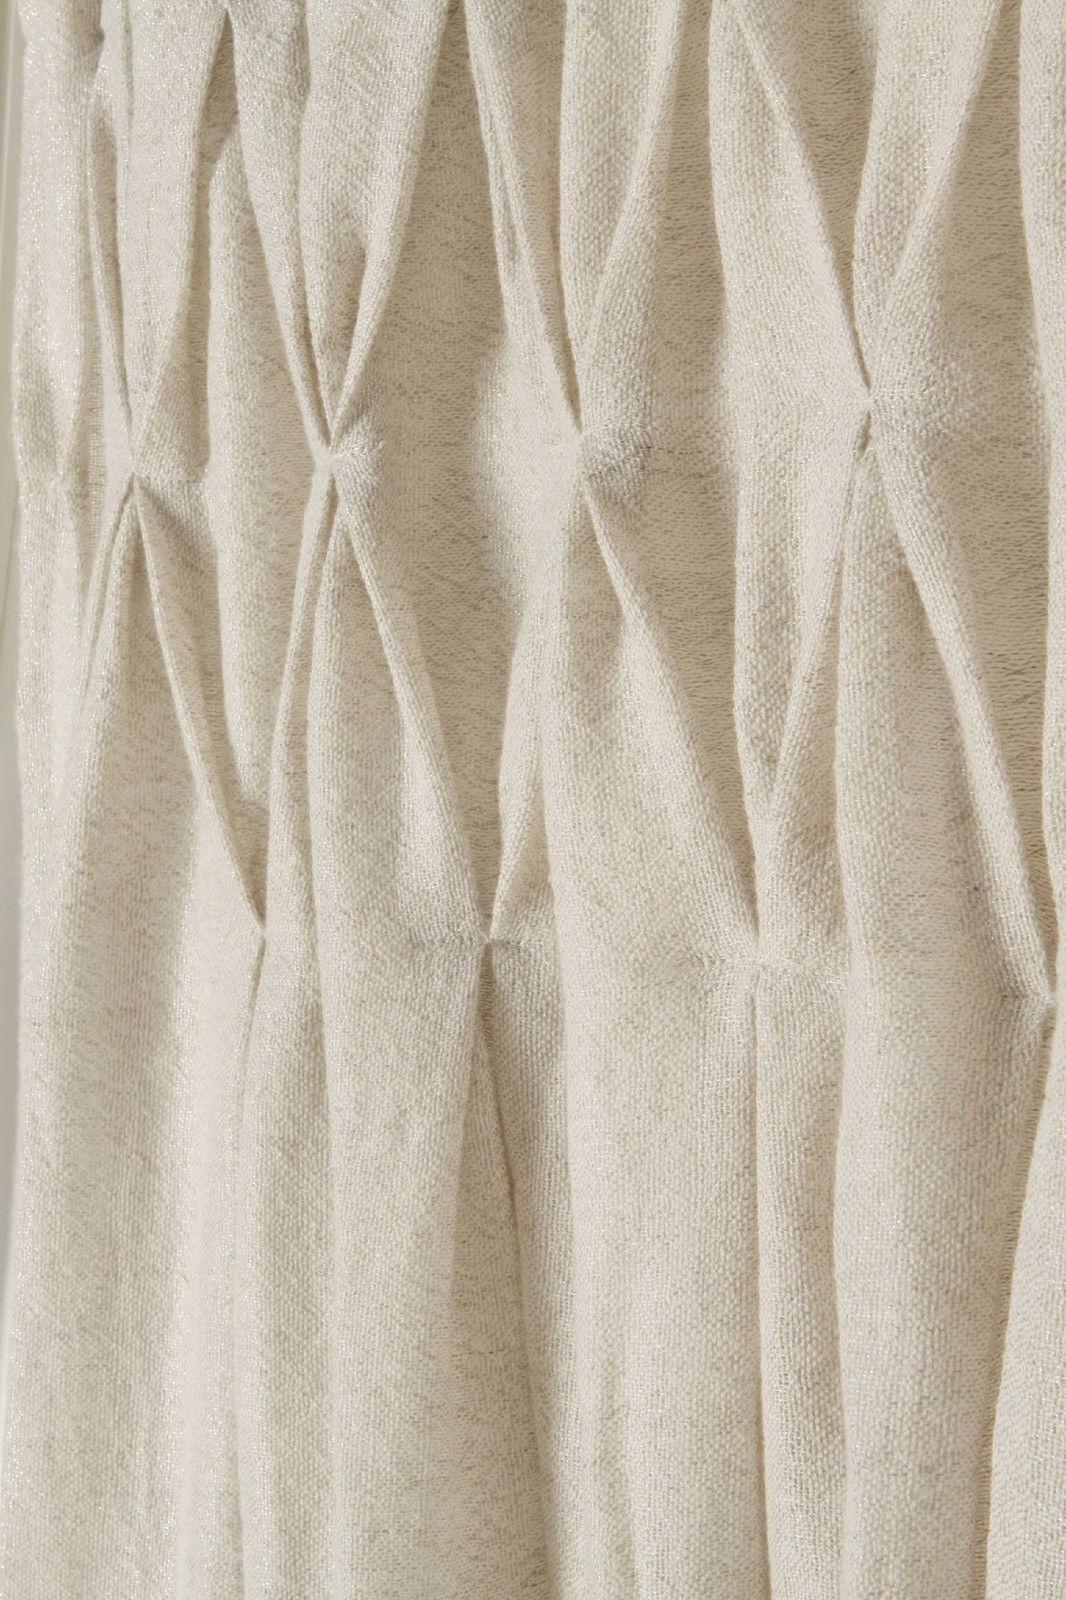 Anthropologie Curtain Panel Neutral Shimmering Wool Linen Linen Linen ONE PANEL, 50  x 63  9c55c0